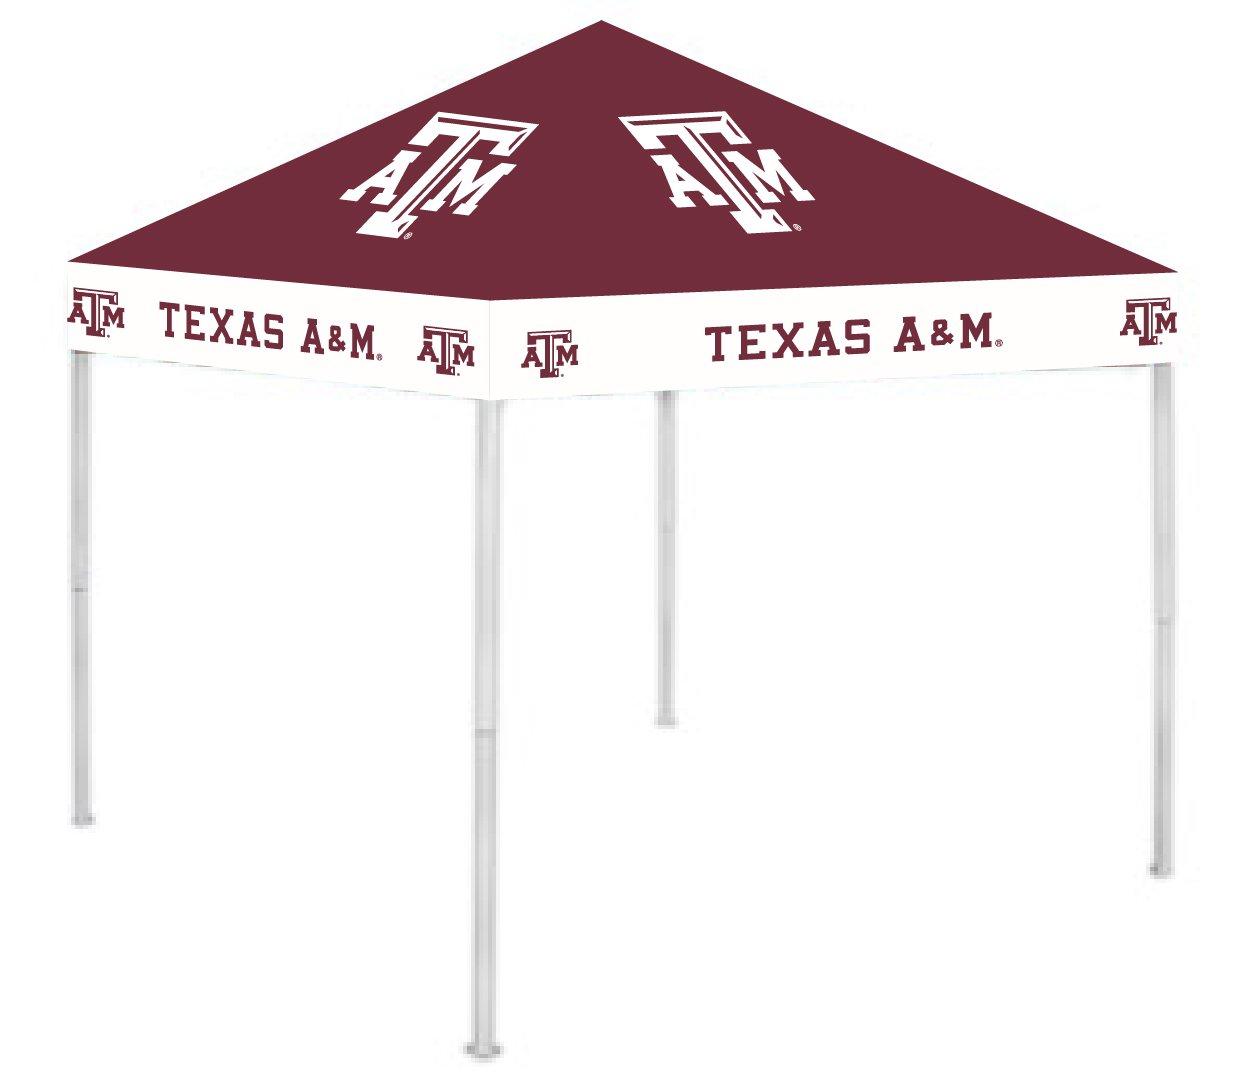 Rivalry RV395-5000 Texas Aand M Canopy B003HLOTYW 9 x 9|テキサスA&M大学アギーズ テキサスA&M大学アギーズ 9 x 9